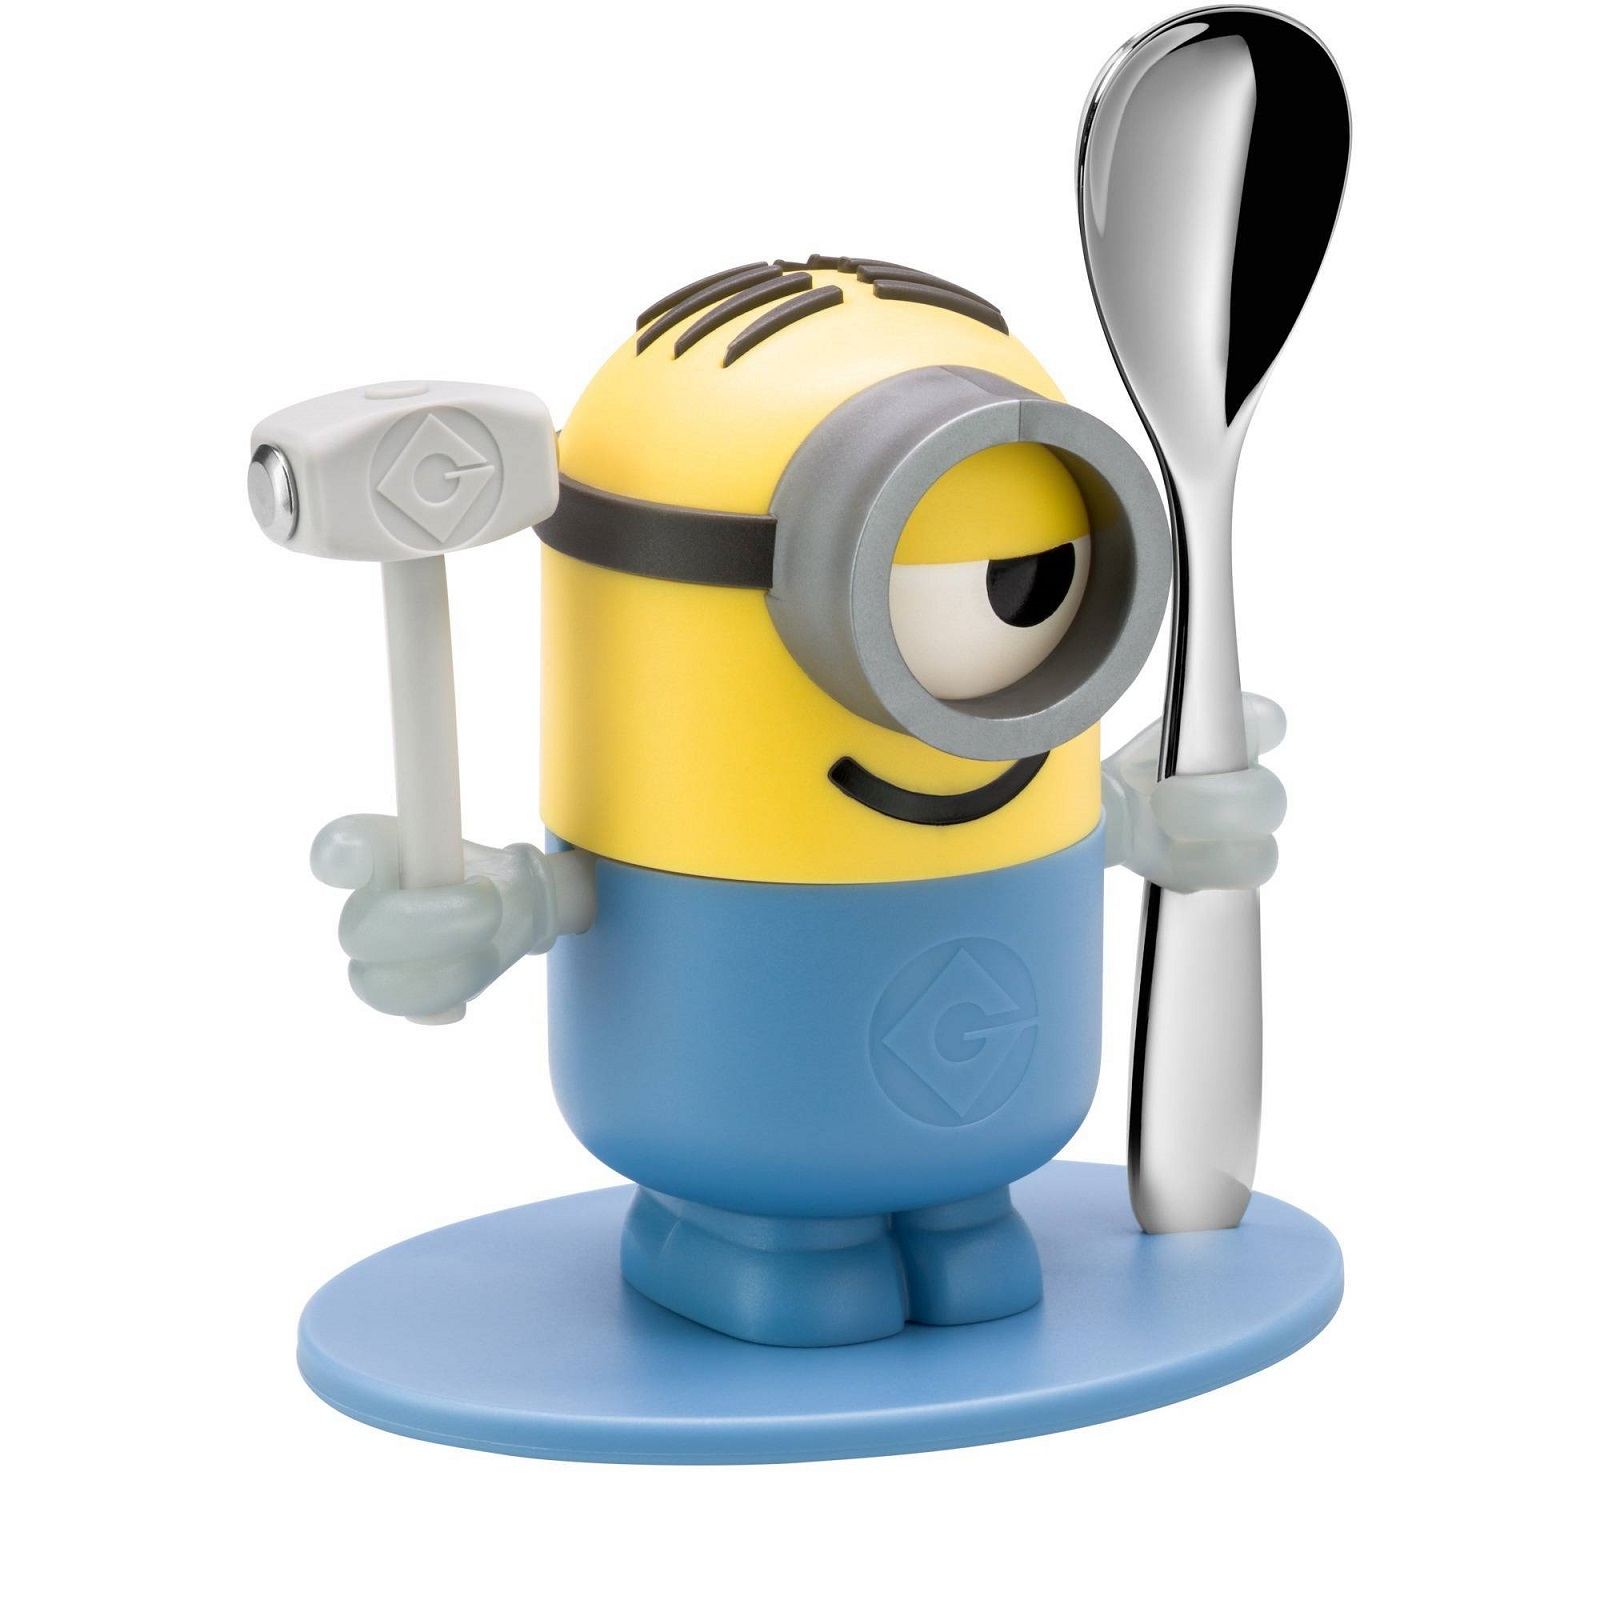 "Онлайн каталог PROMENU: Набор детский: подставка для яйца и ложка ""Миньон"" WMF MINIONS, разноцветный, 2 предмета                               12 8622 6040"